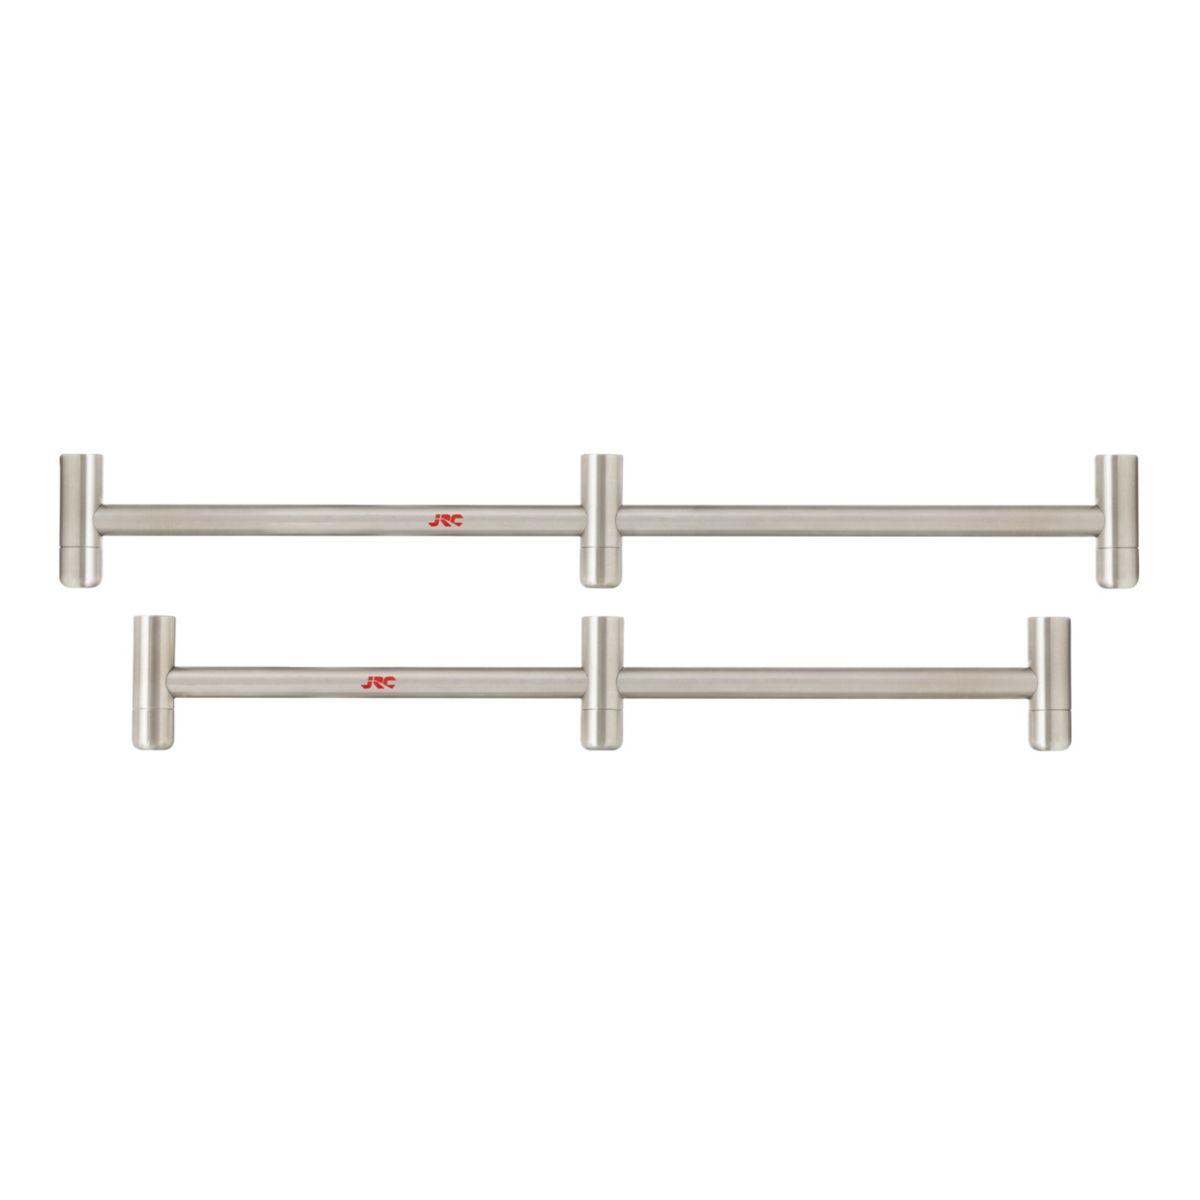 JRC Hrazda na 3 pruty JRC Extreme TXS Buzz Bar 3 Rod